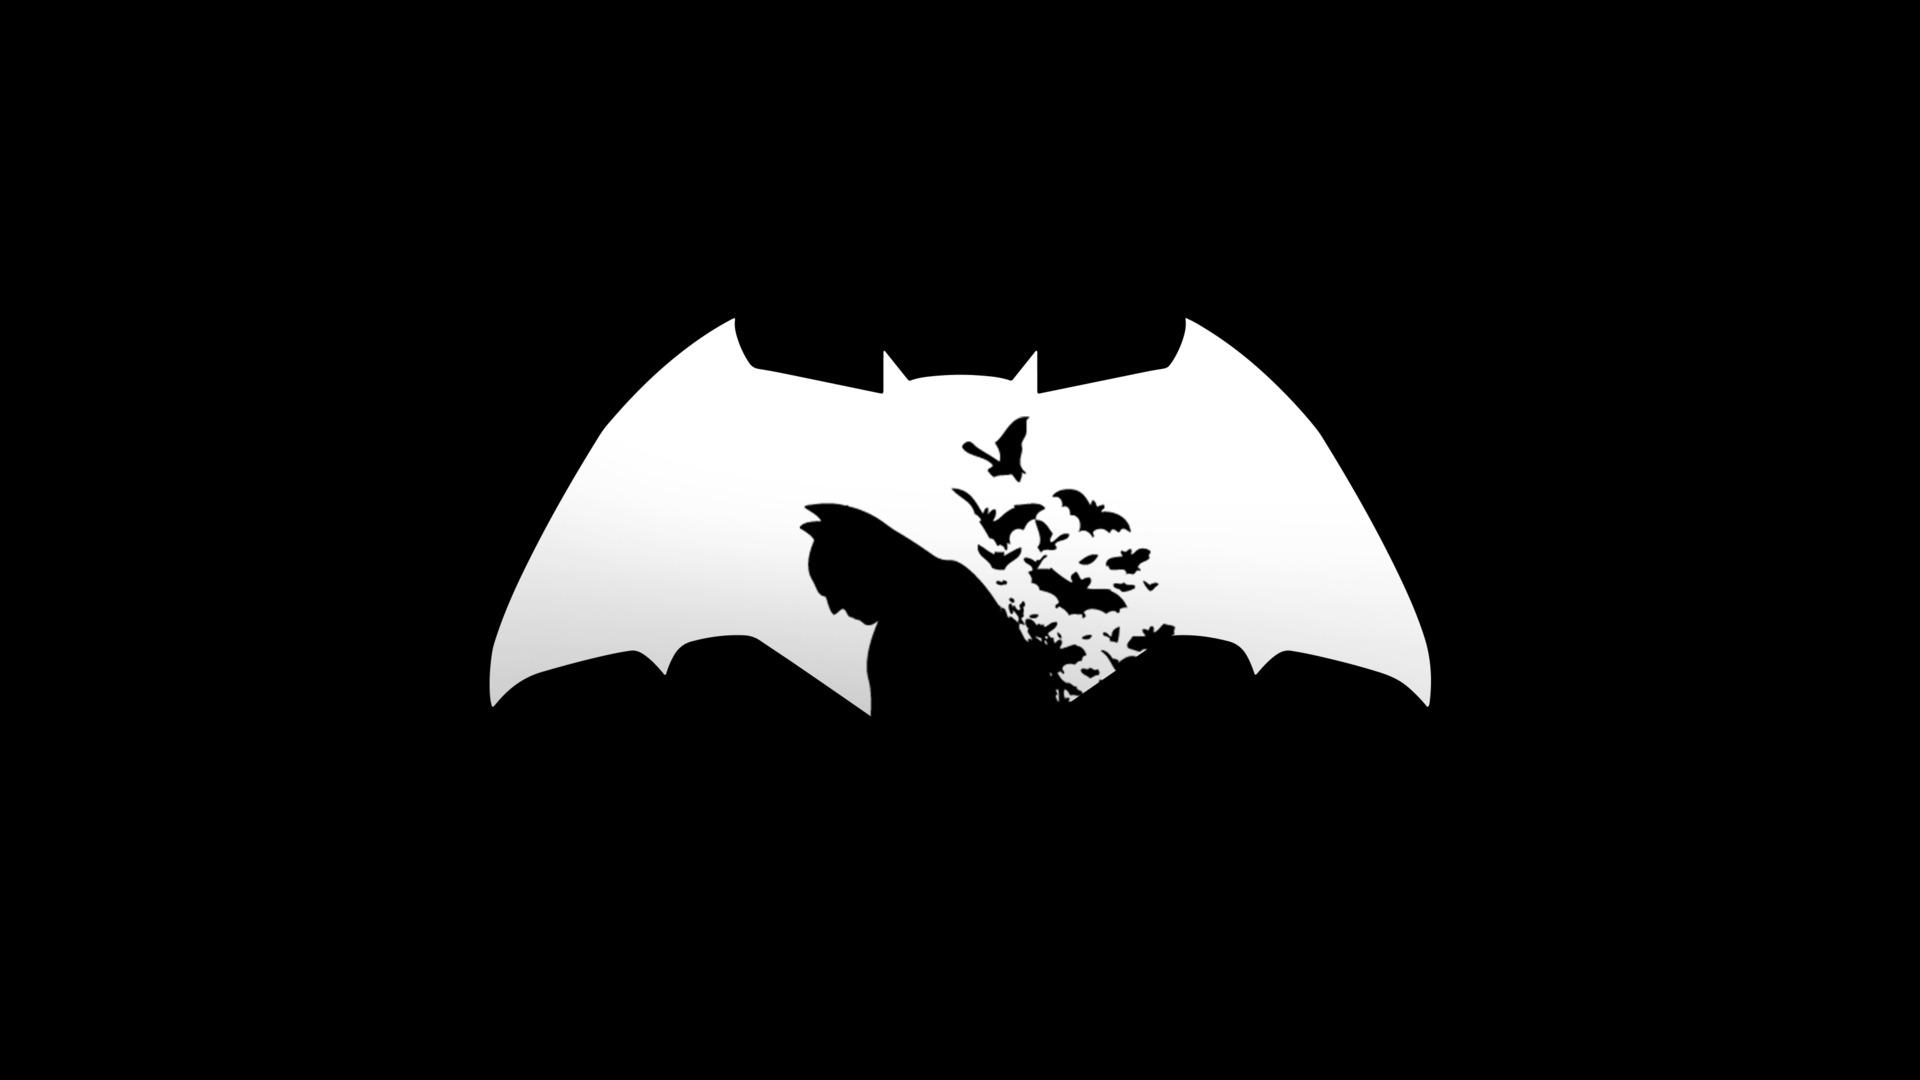 batman-dark-simple-hd.jpg